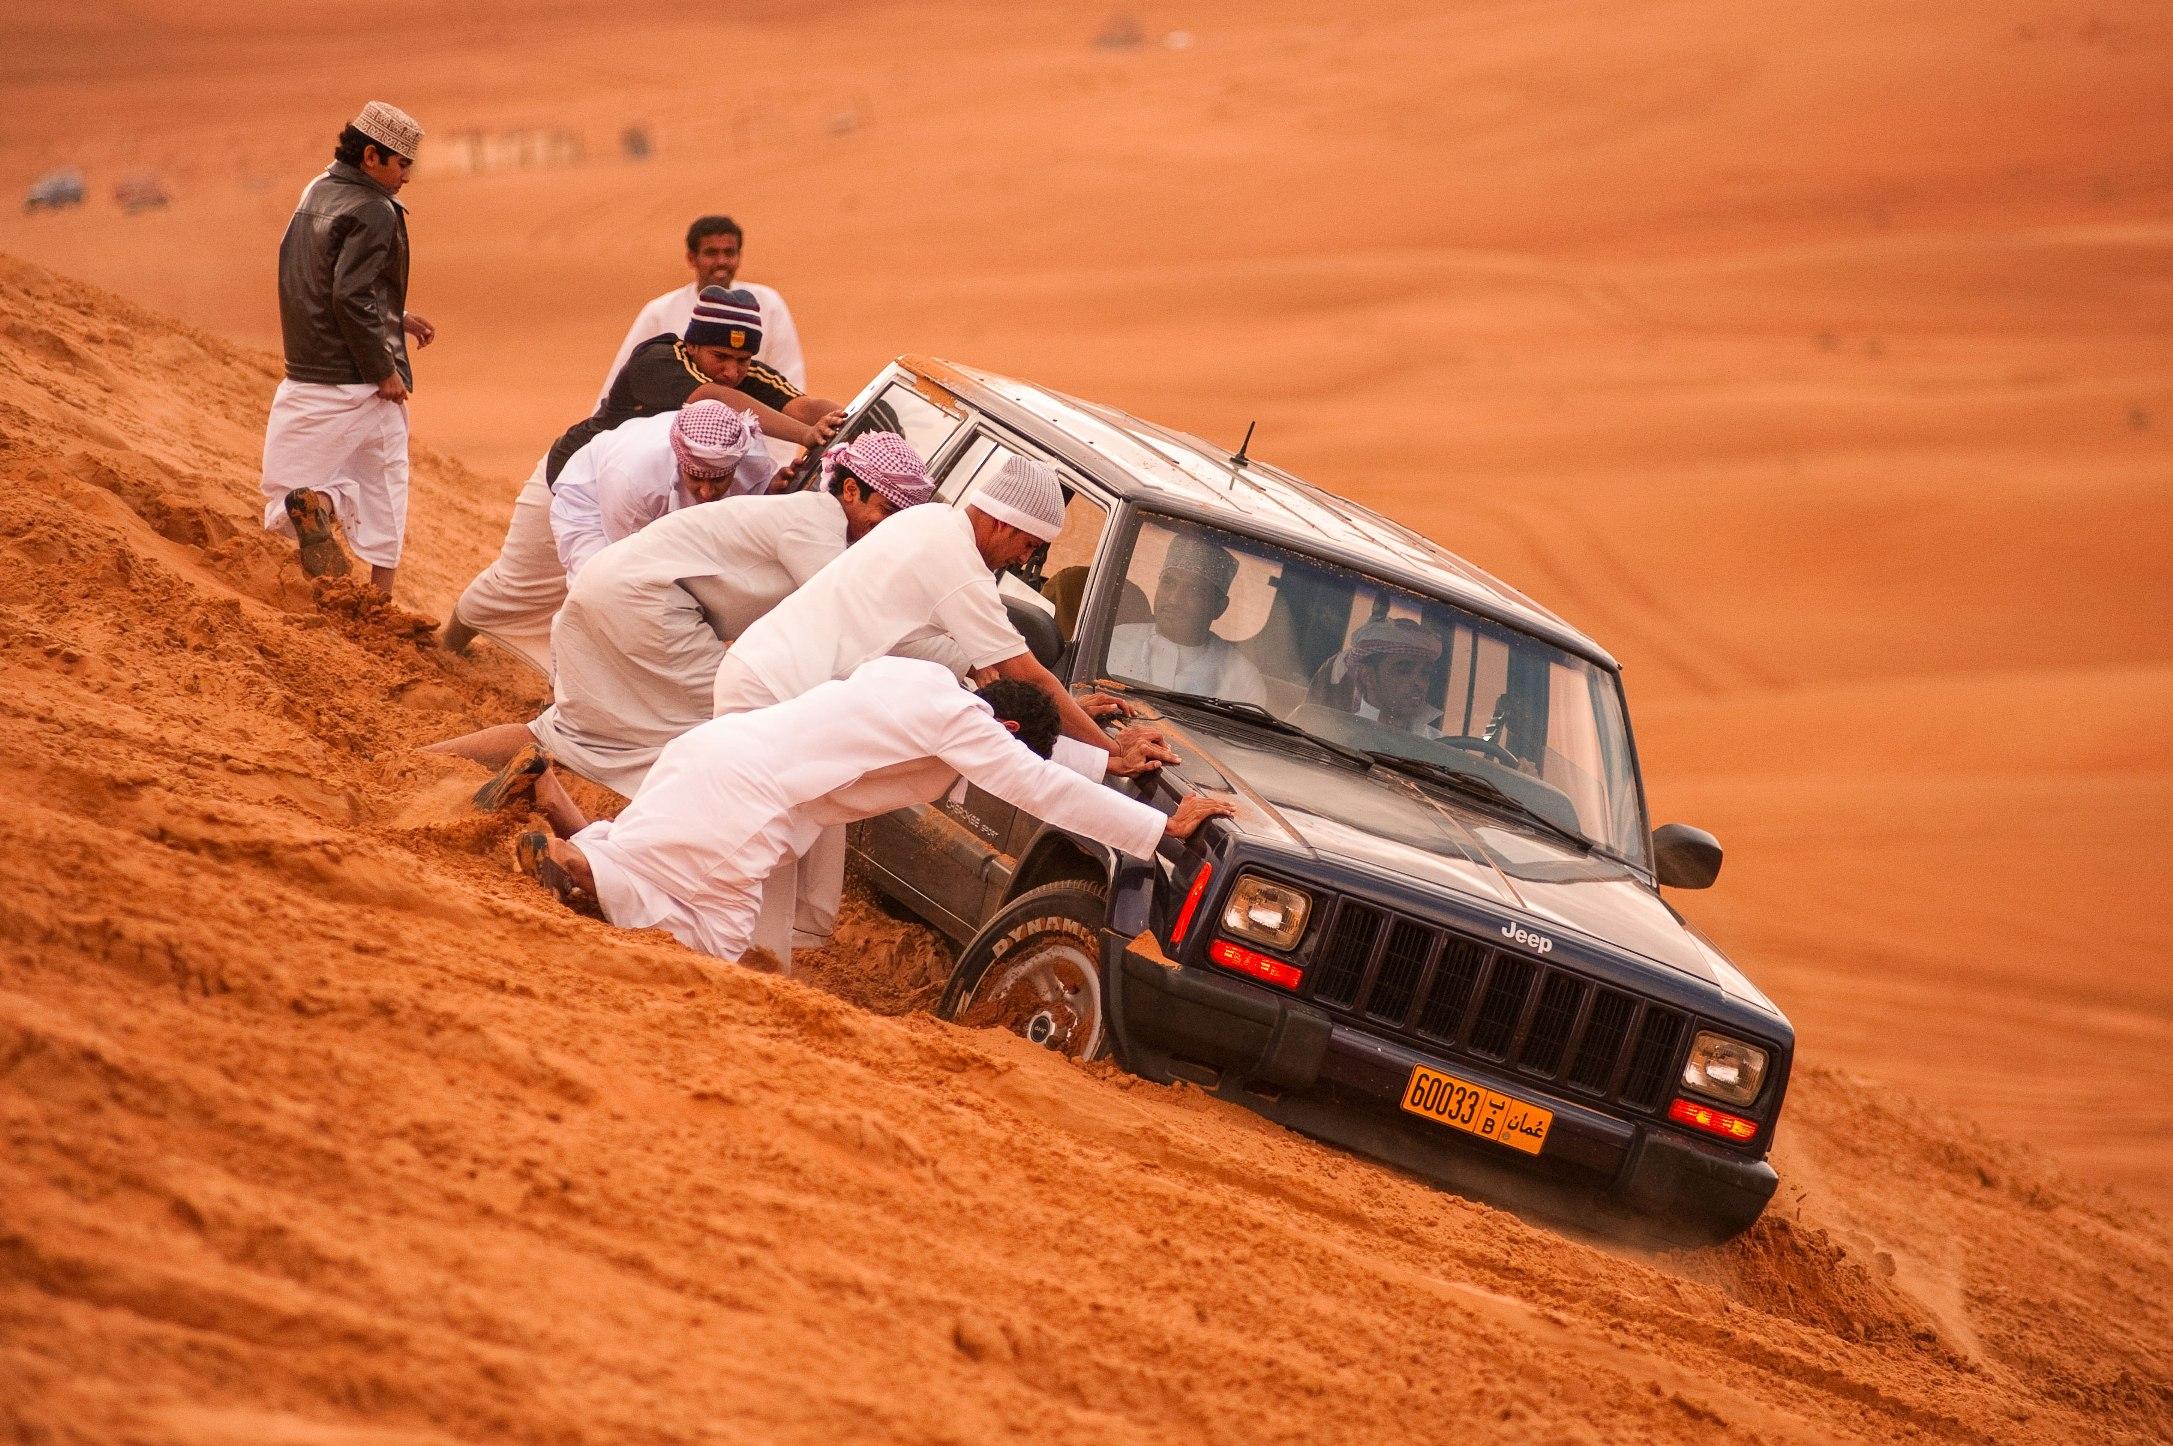 EHM_Oman-und-Emirate_Hartmut-Fiebig.jpg